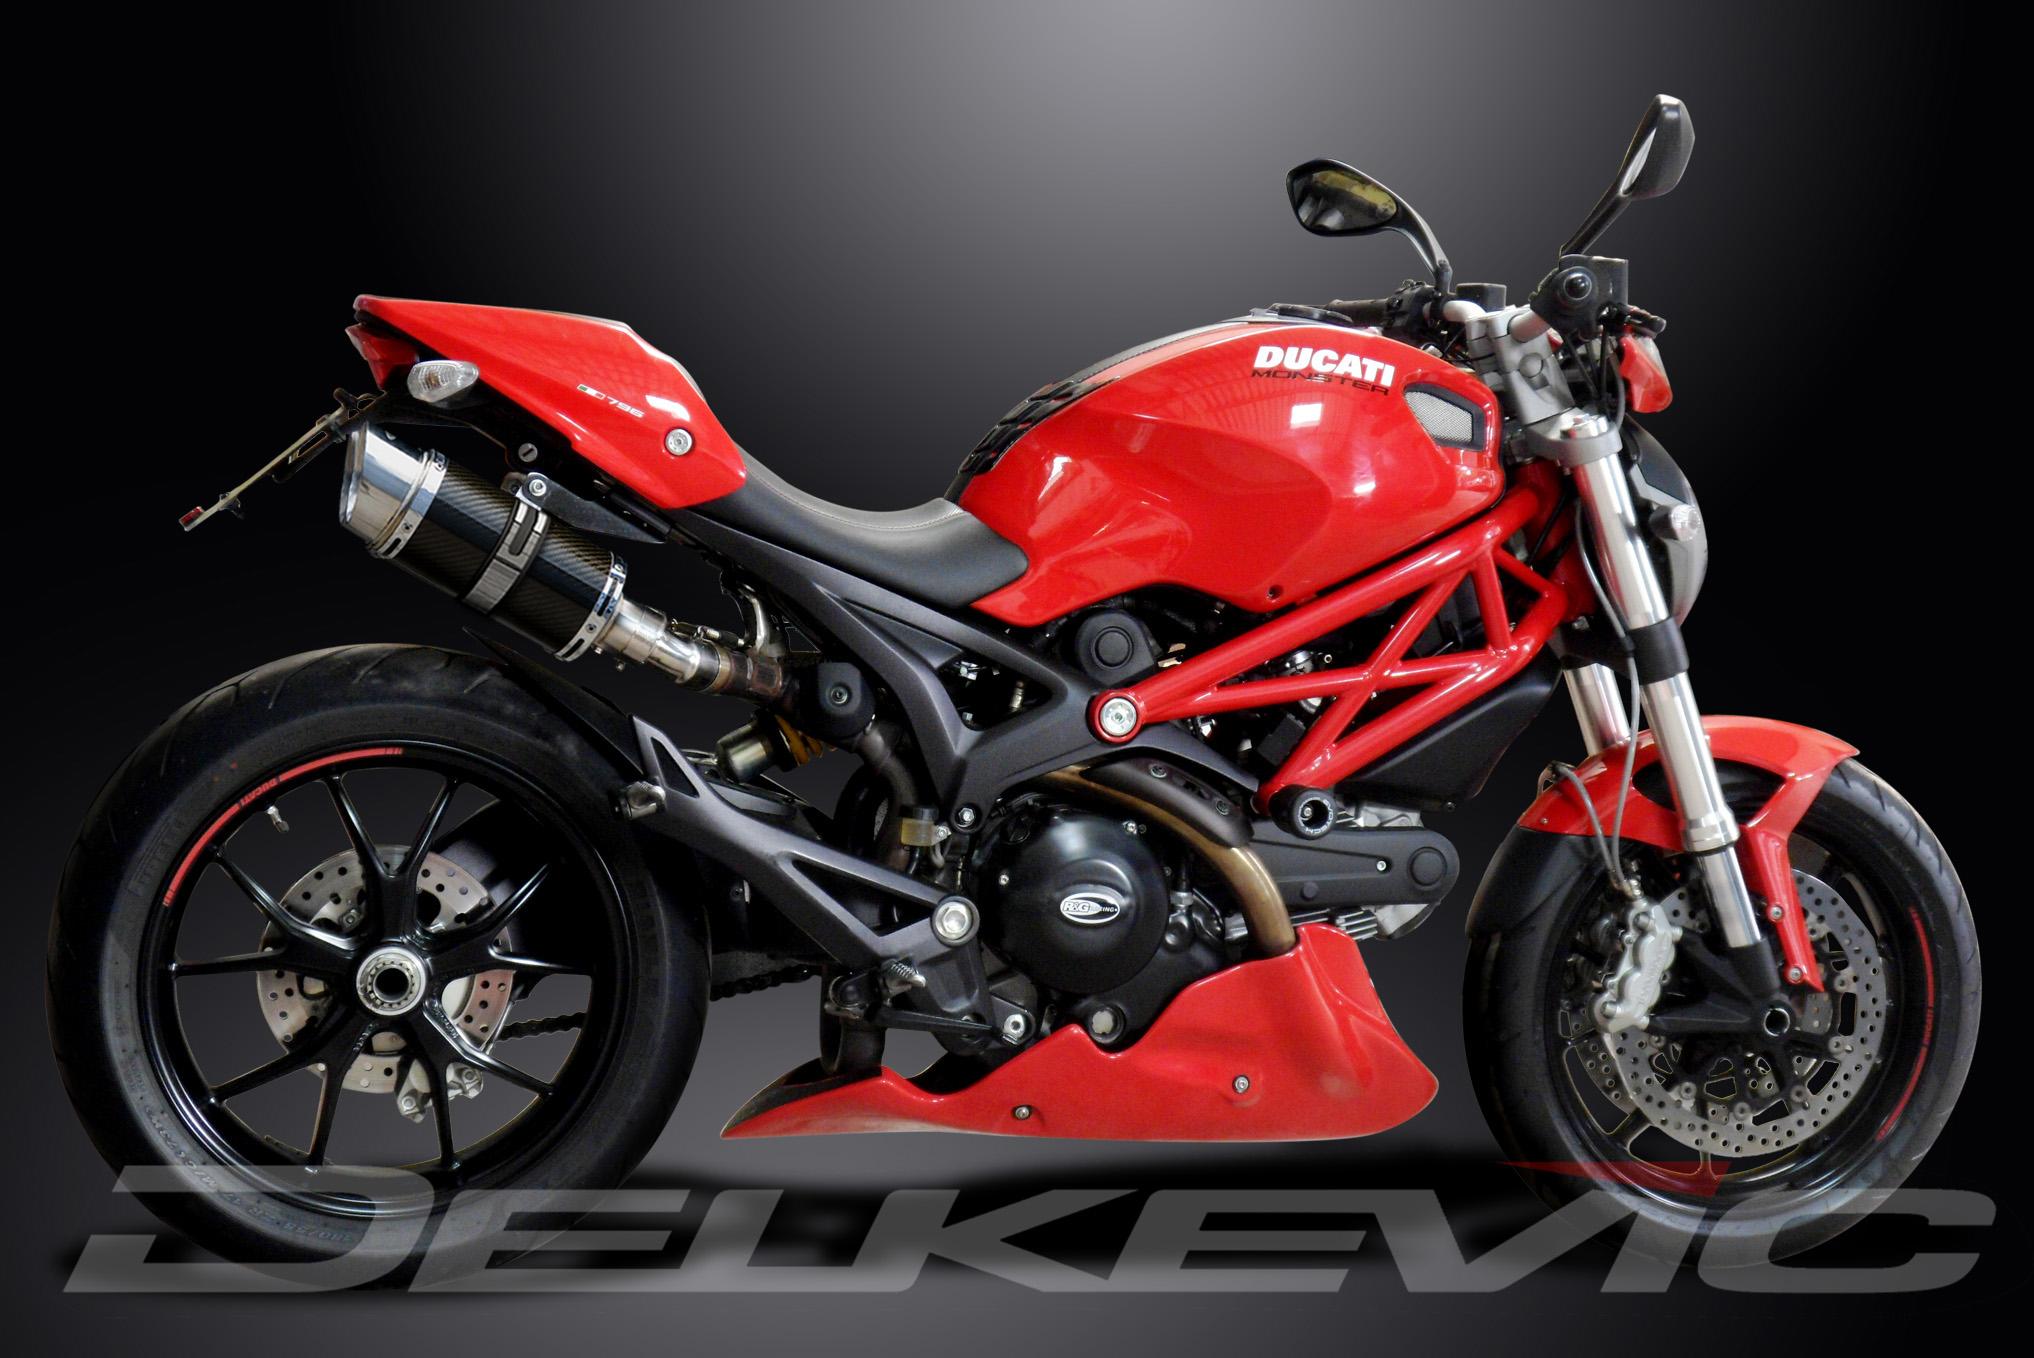 Mini Bike Ducati : Ducati monster quot mini carbon round muffler exhaust